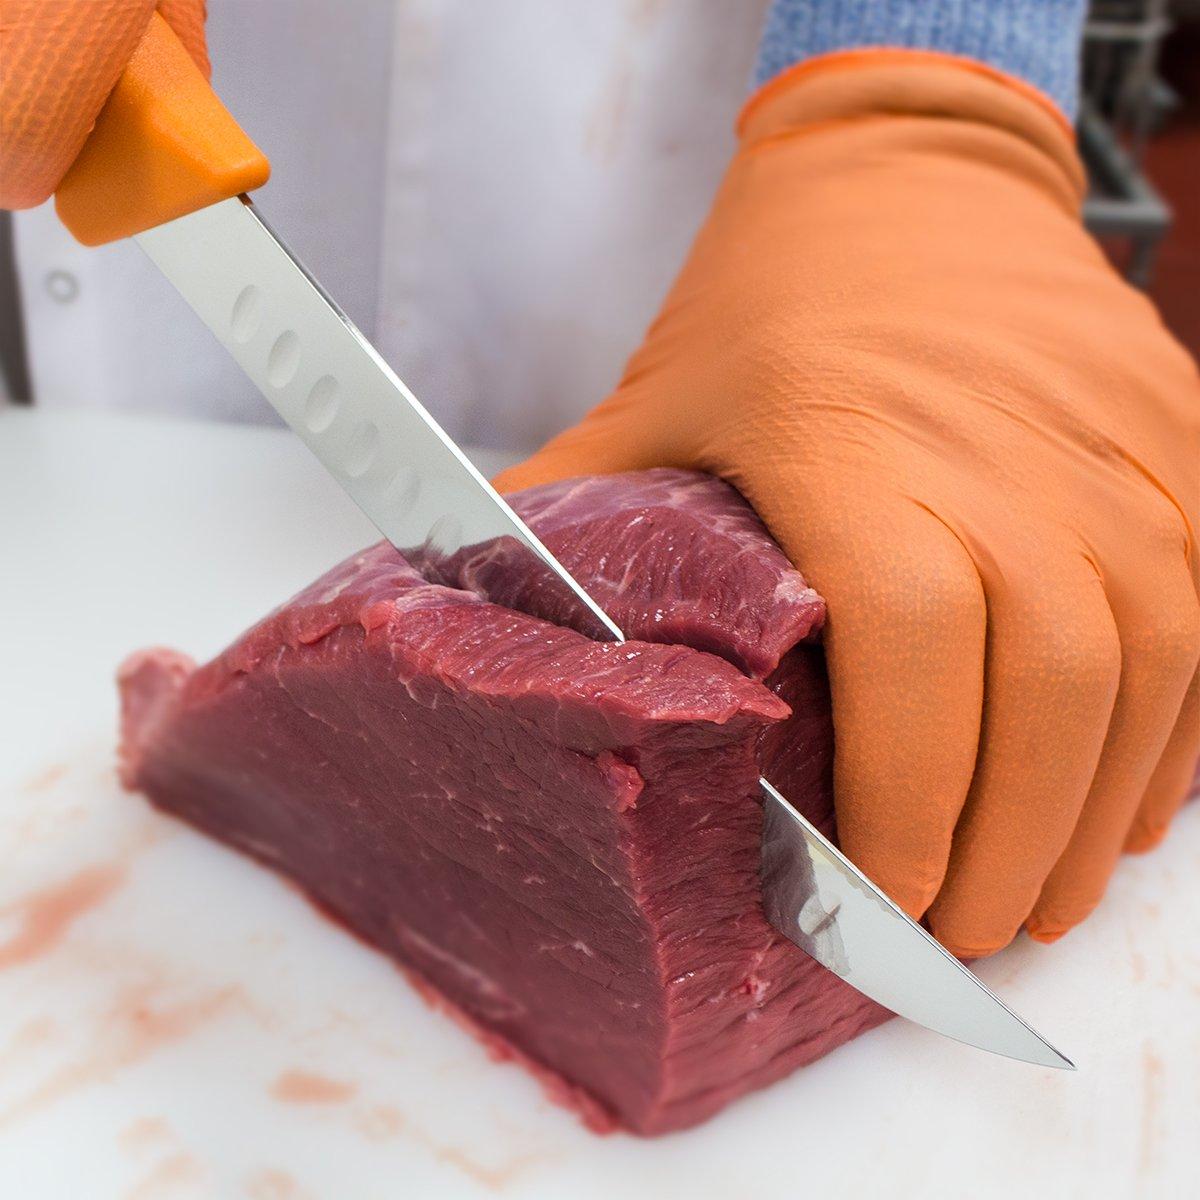 UltraSource Breaking Butcher Knife, 8'' Fluted Blade by UltraSource (Image #2)